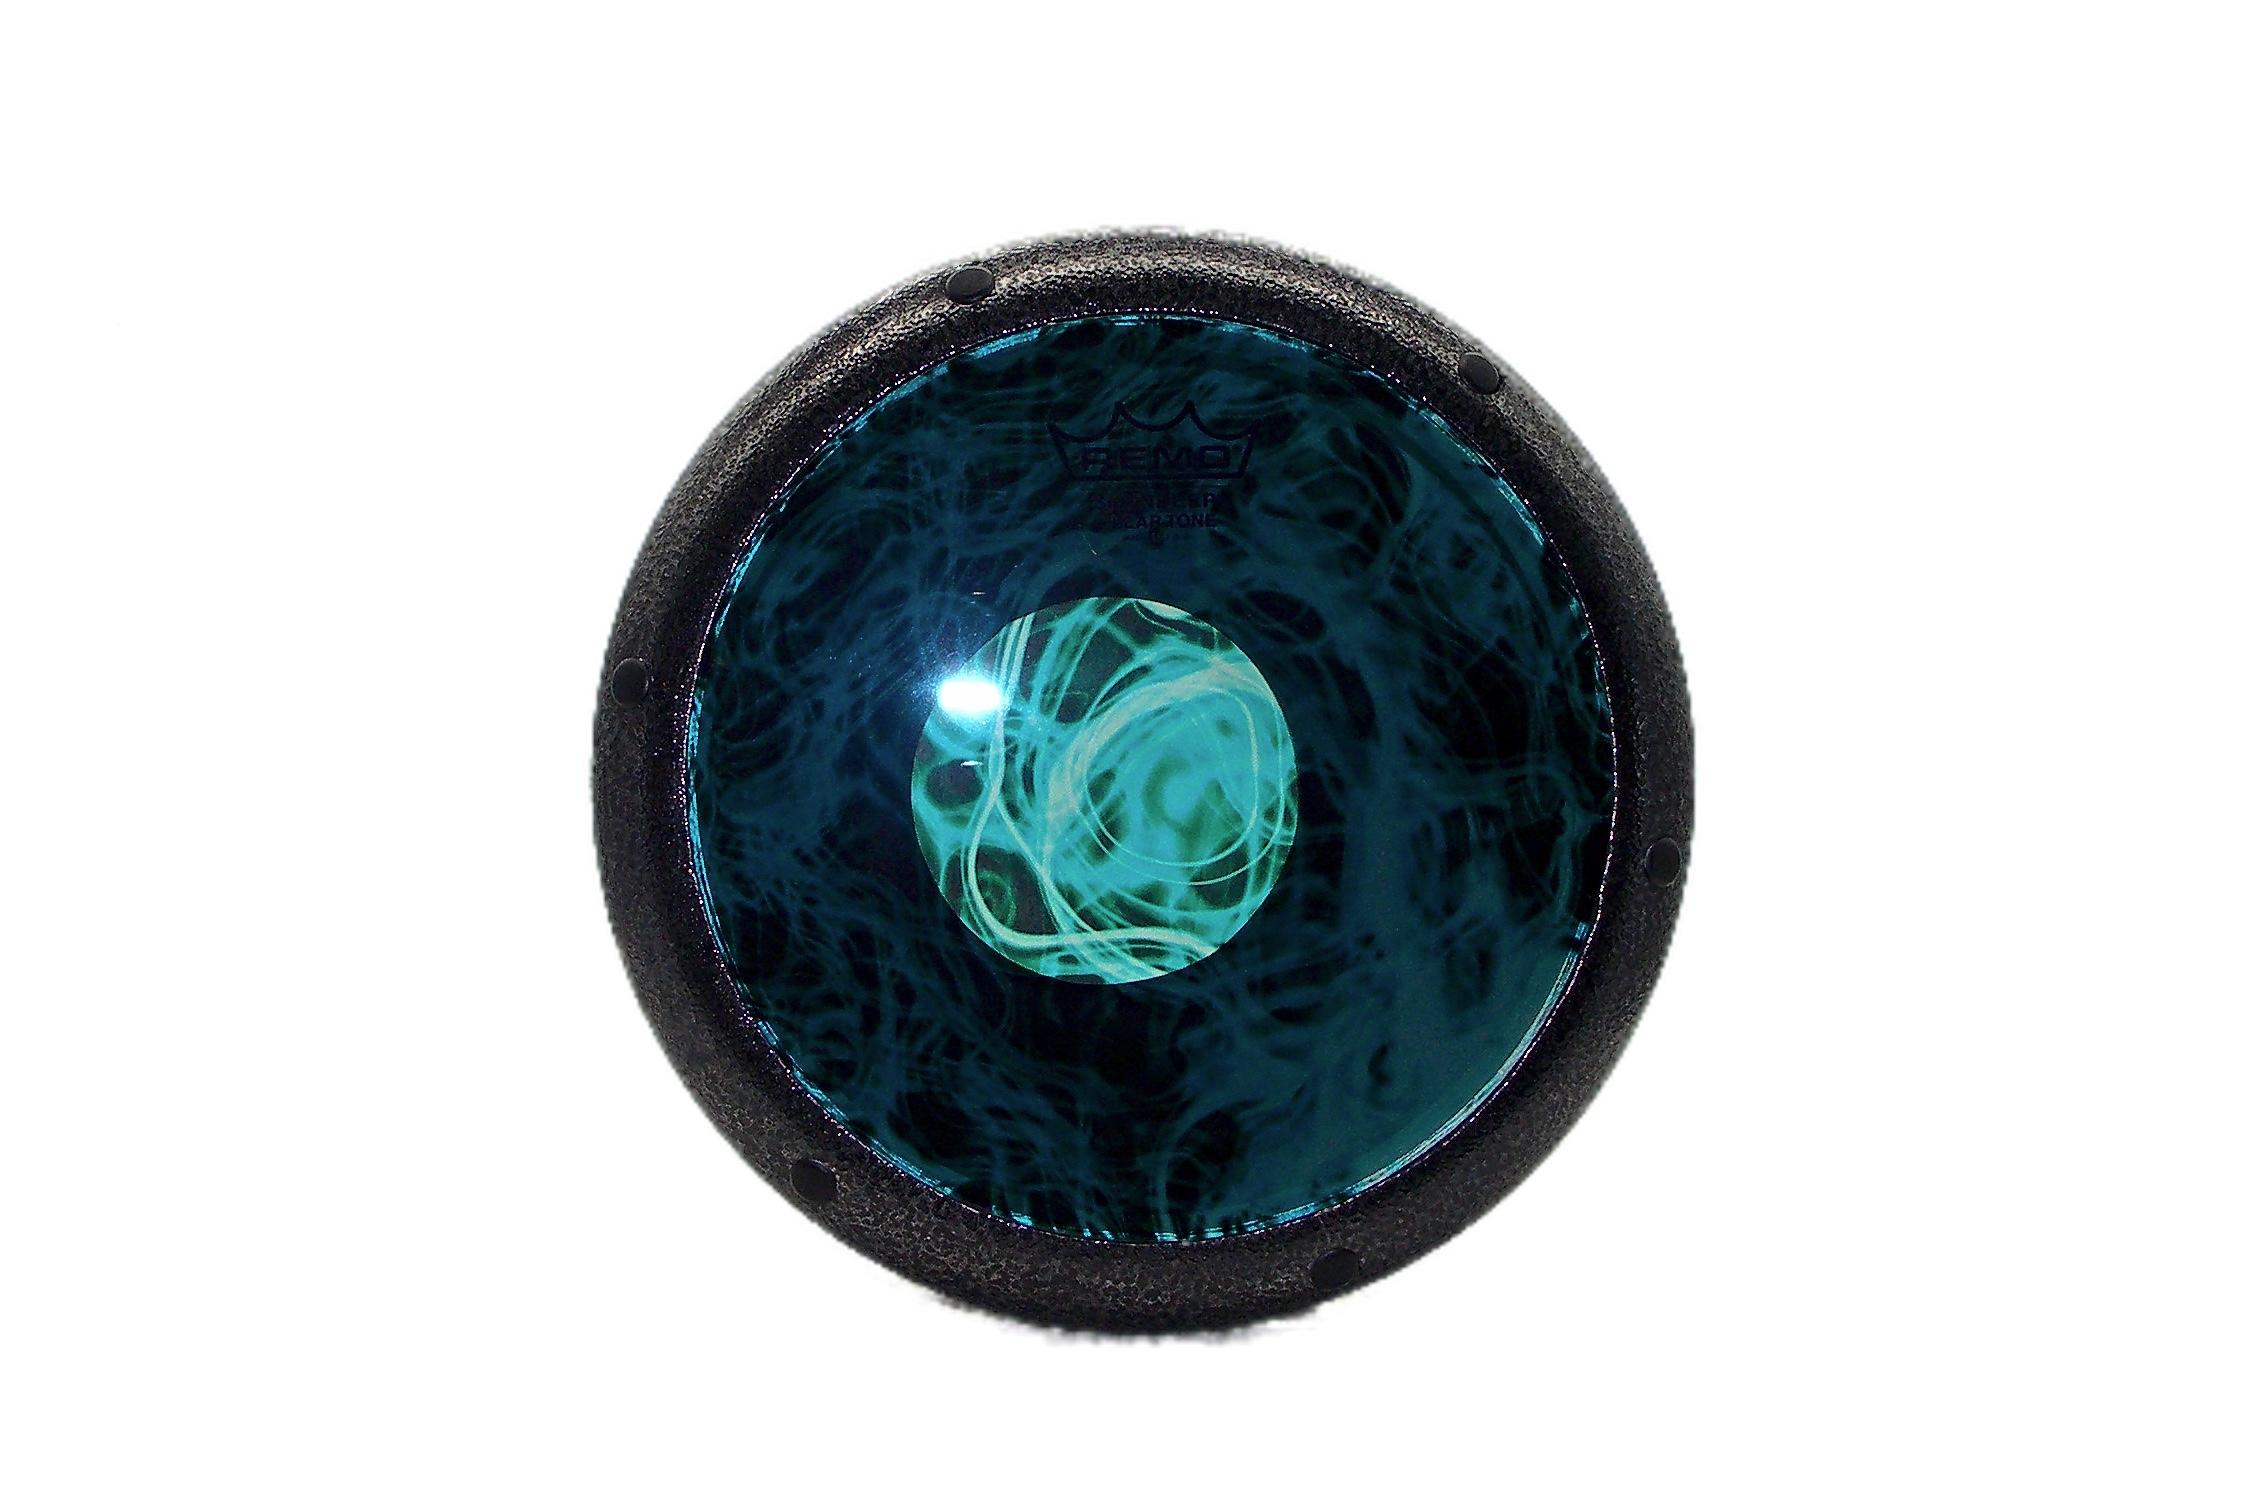 GEF-Silver-Metallic-Finish-Turquoise-Mist-Cleartone-Head-Darabuka